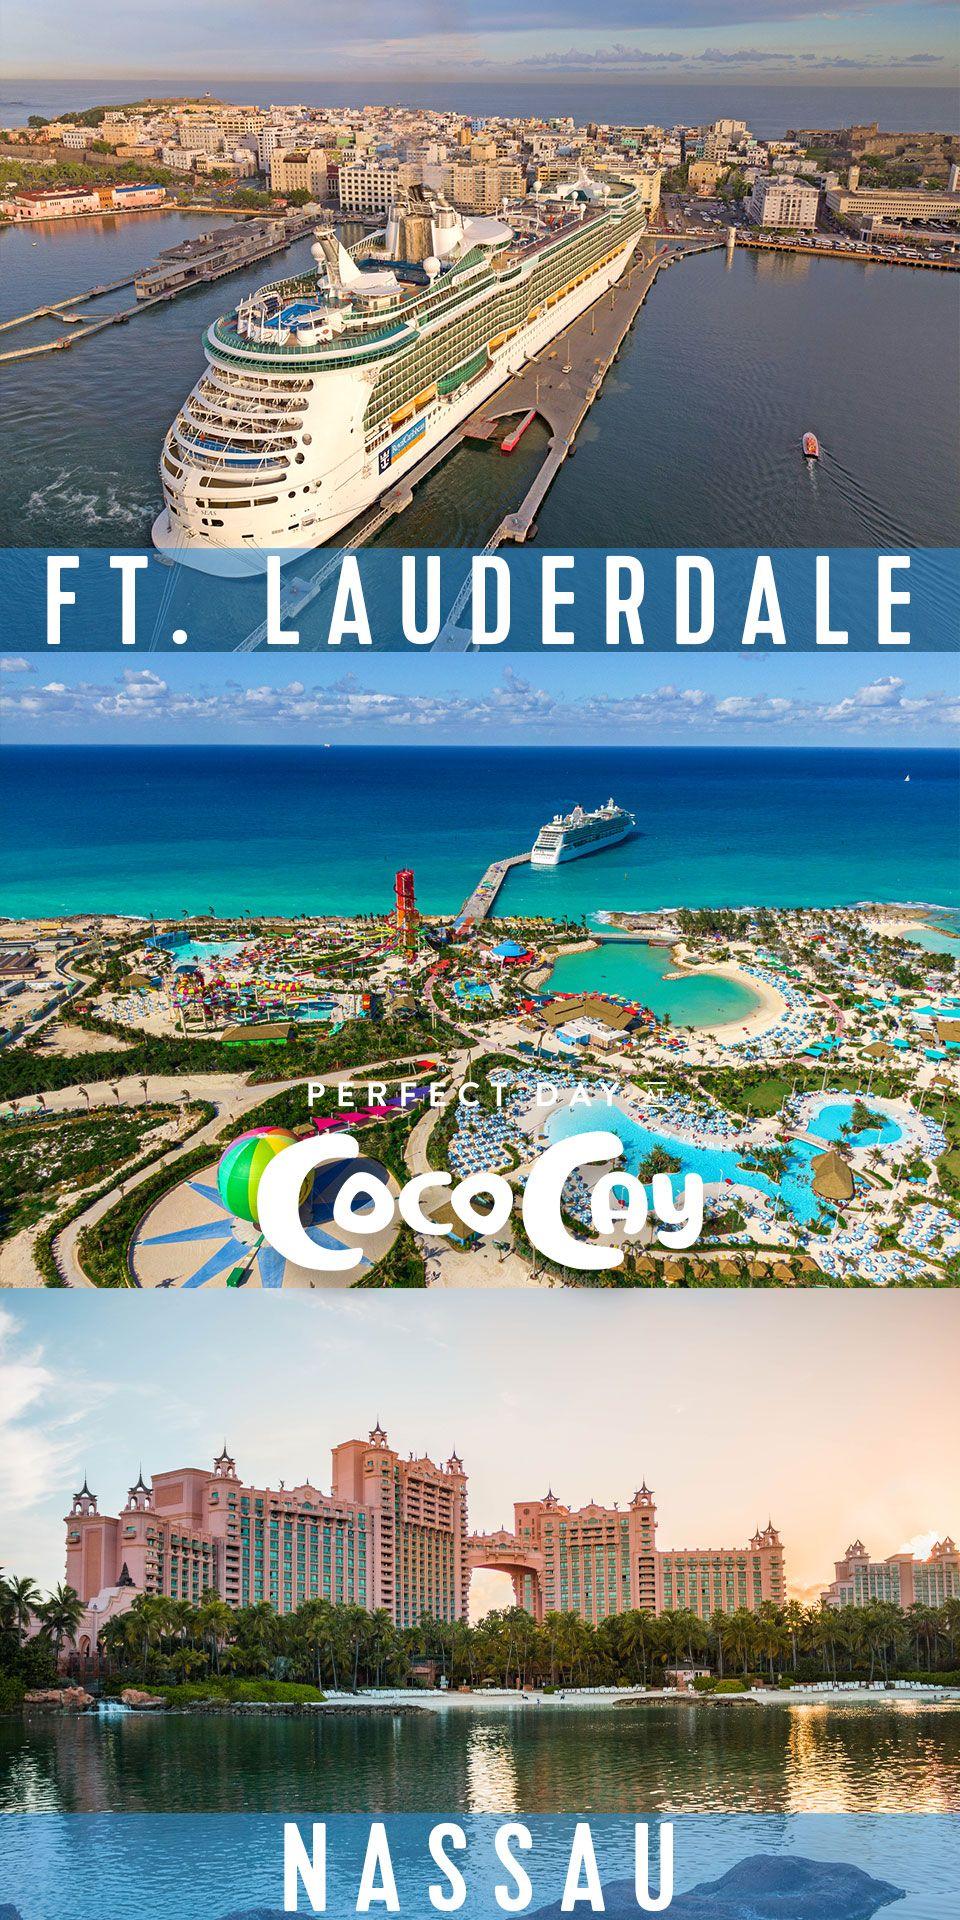 3 Night Bahamas Perfect Day Cruise Royal Caribbean Cruises In 2020 Independence Of The Seas Royal Caribbean Cruise Caribbean Cruise